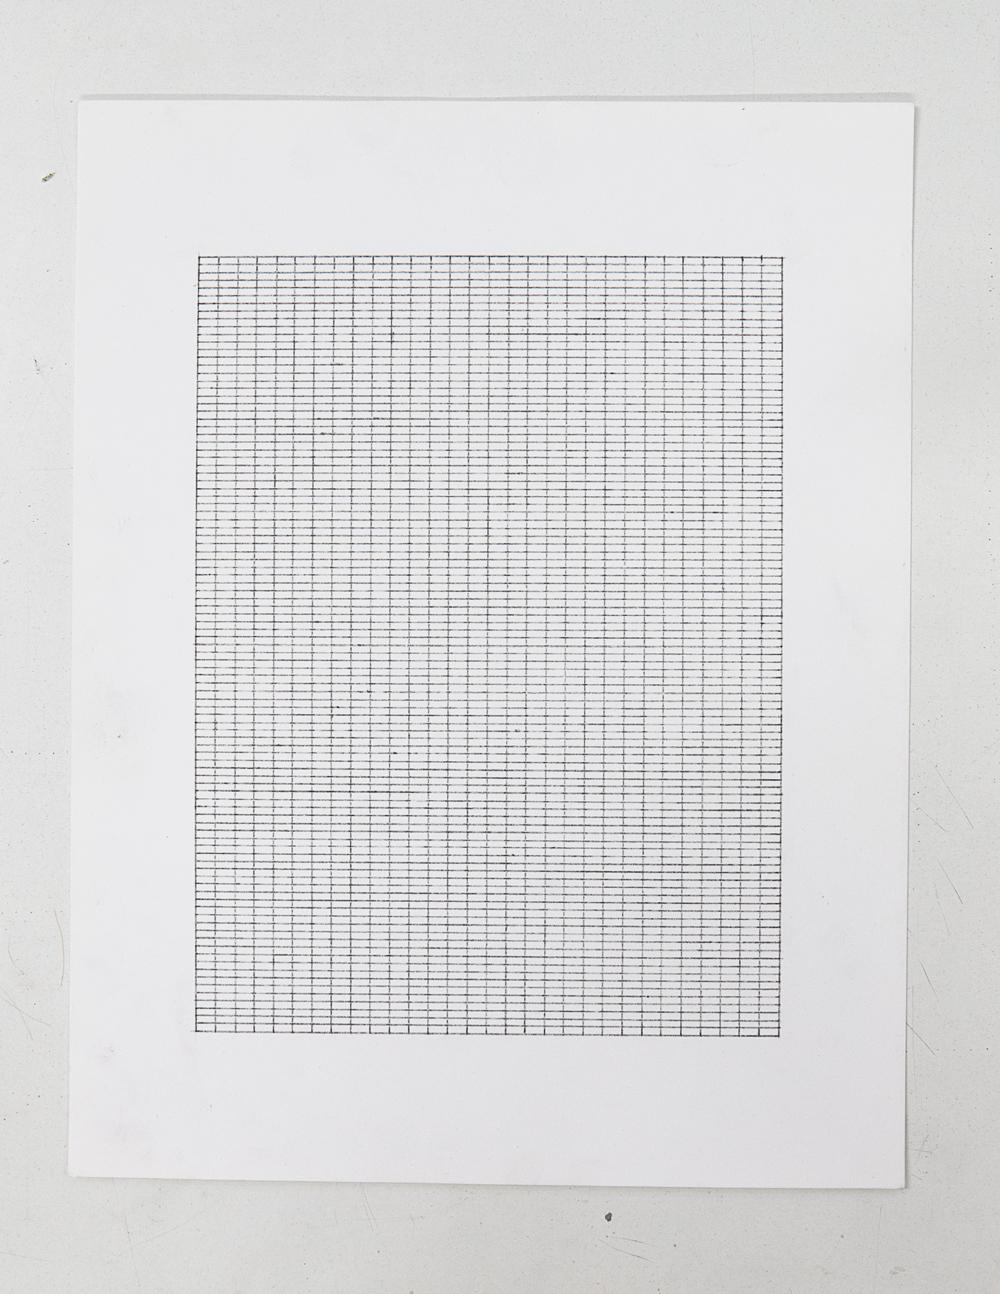 (PRISONTIME/PRISONINME: Transition to Metric)   5mm x 2mm on 15cm x 20cm  ,2014   Pencil on semi-matte inkjet fiber paper, 8.5 in.x 11 in.